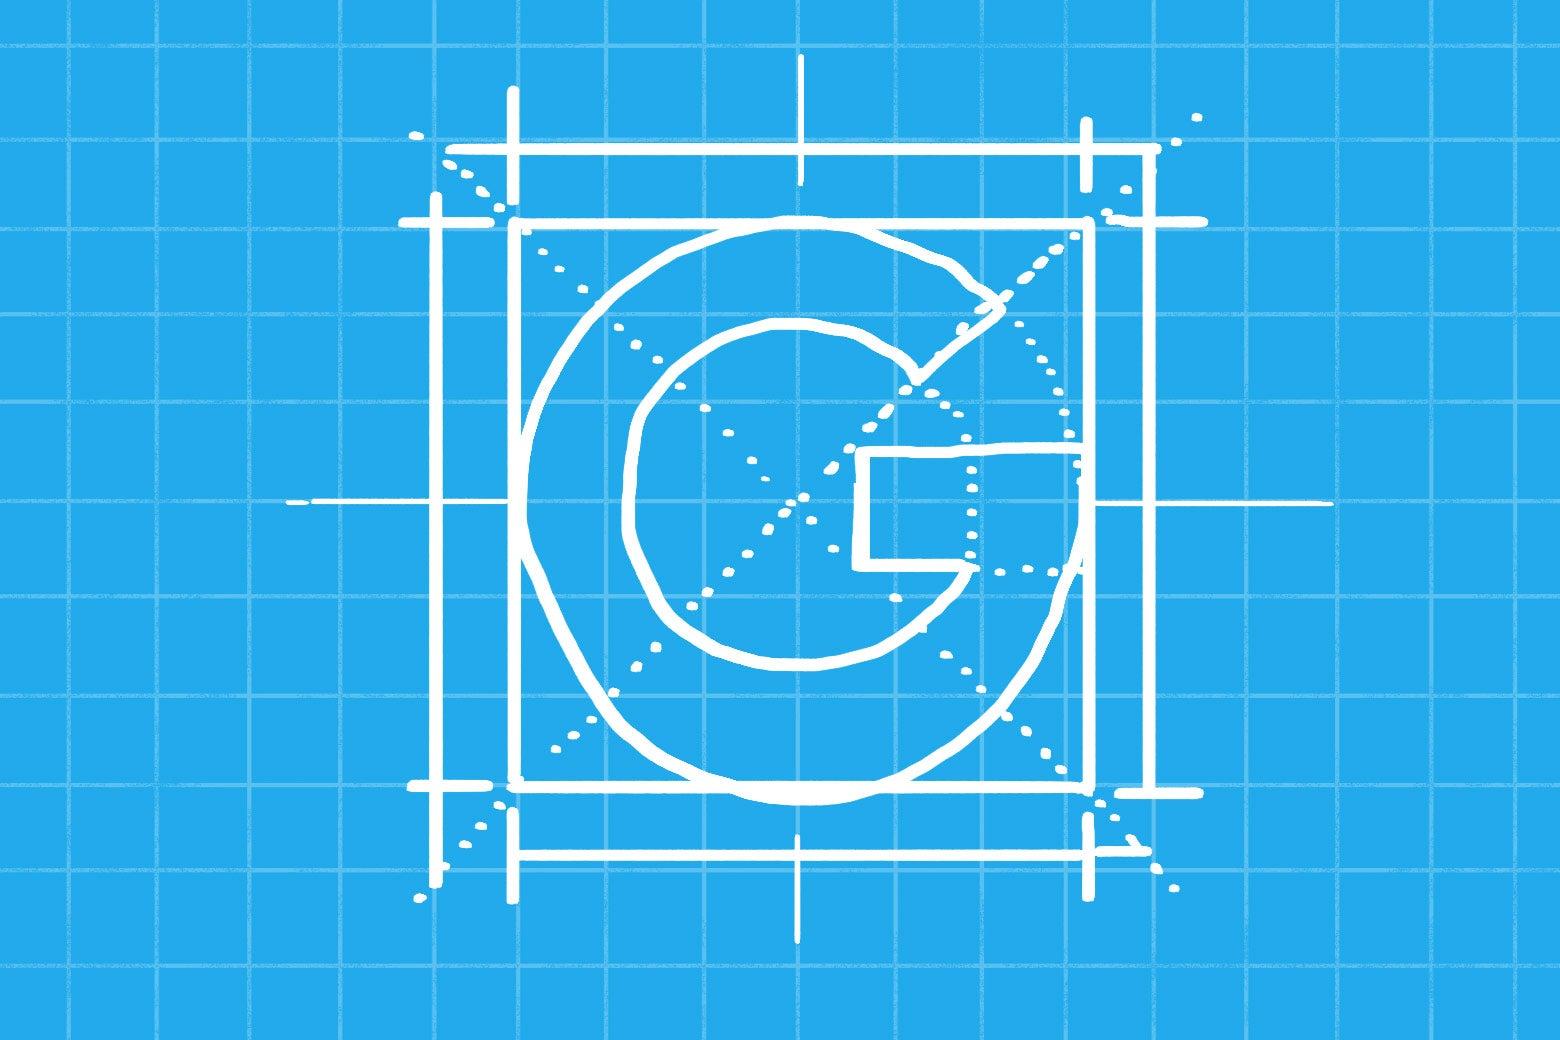 The Google logo in blueprint form.